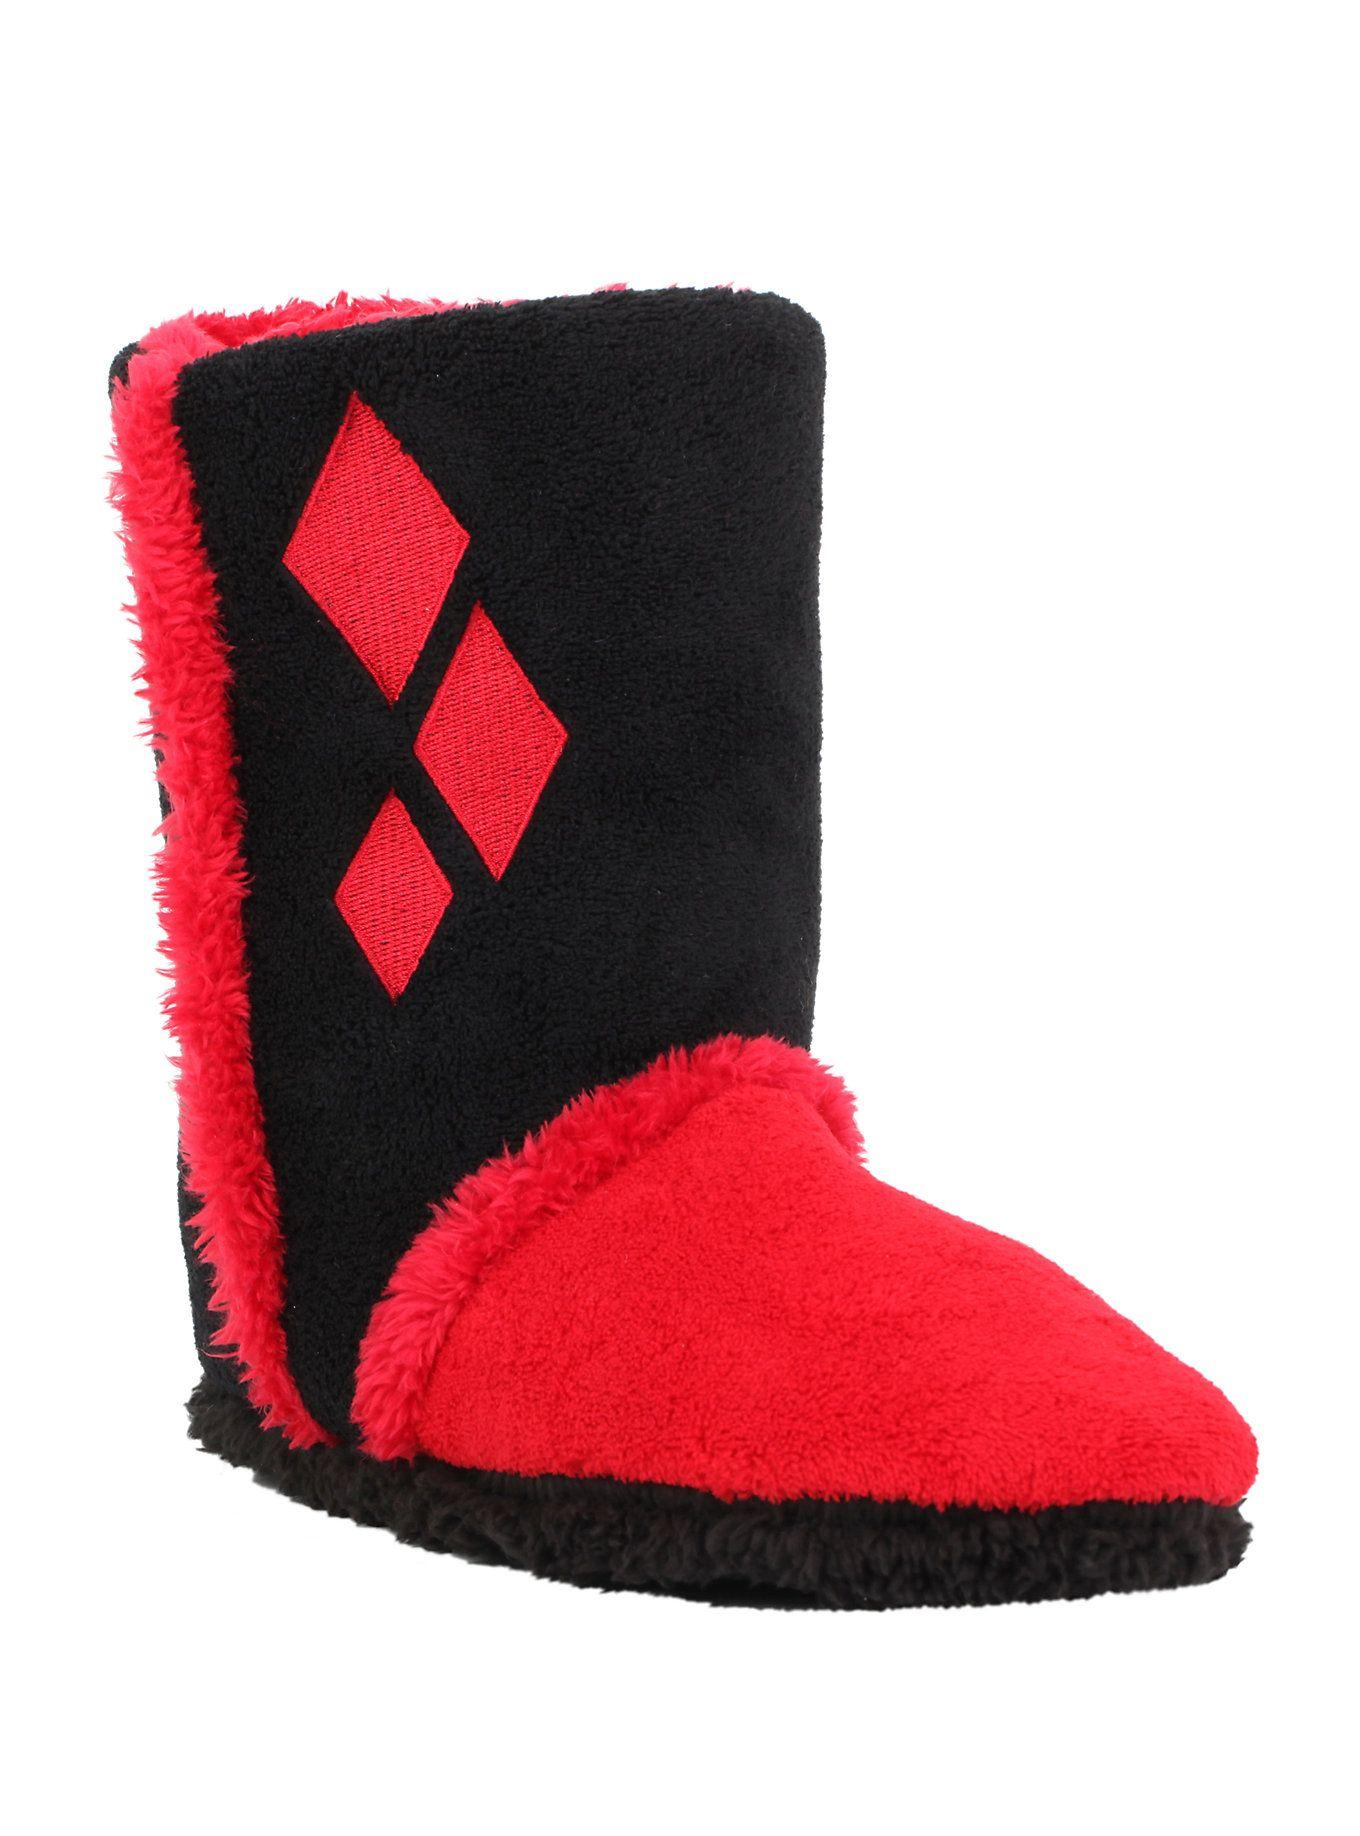 f6fe4c258bcc DC Comics Harley Quinn Slipper Boots in 2019